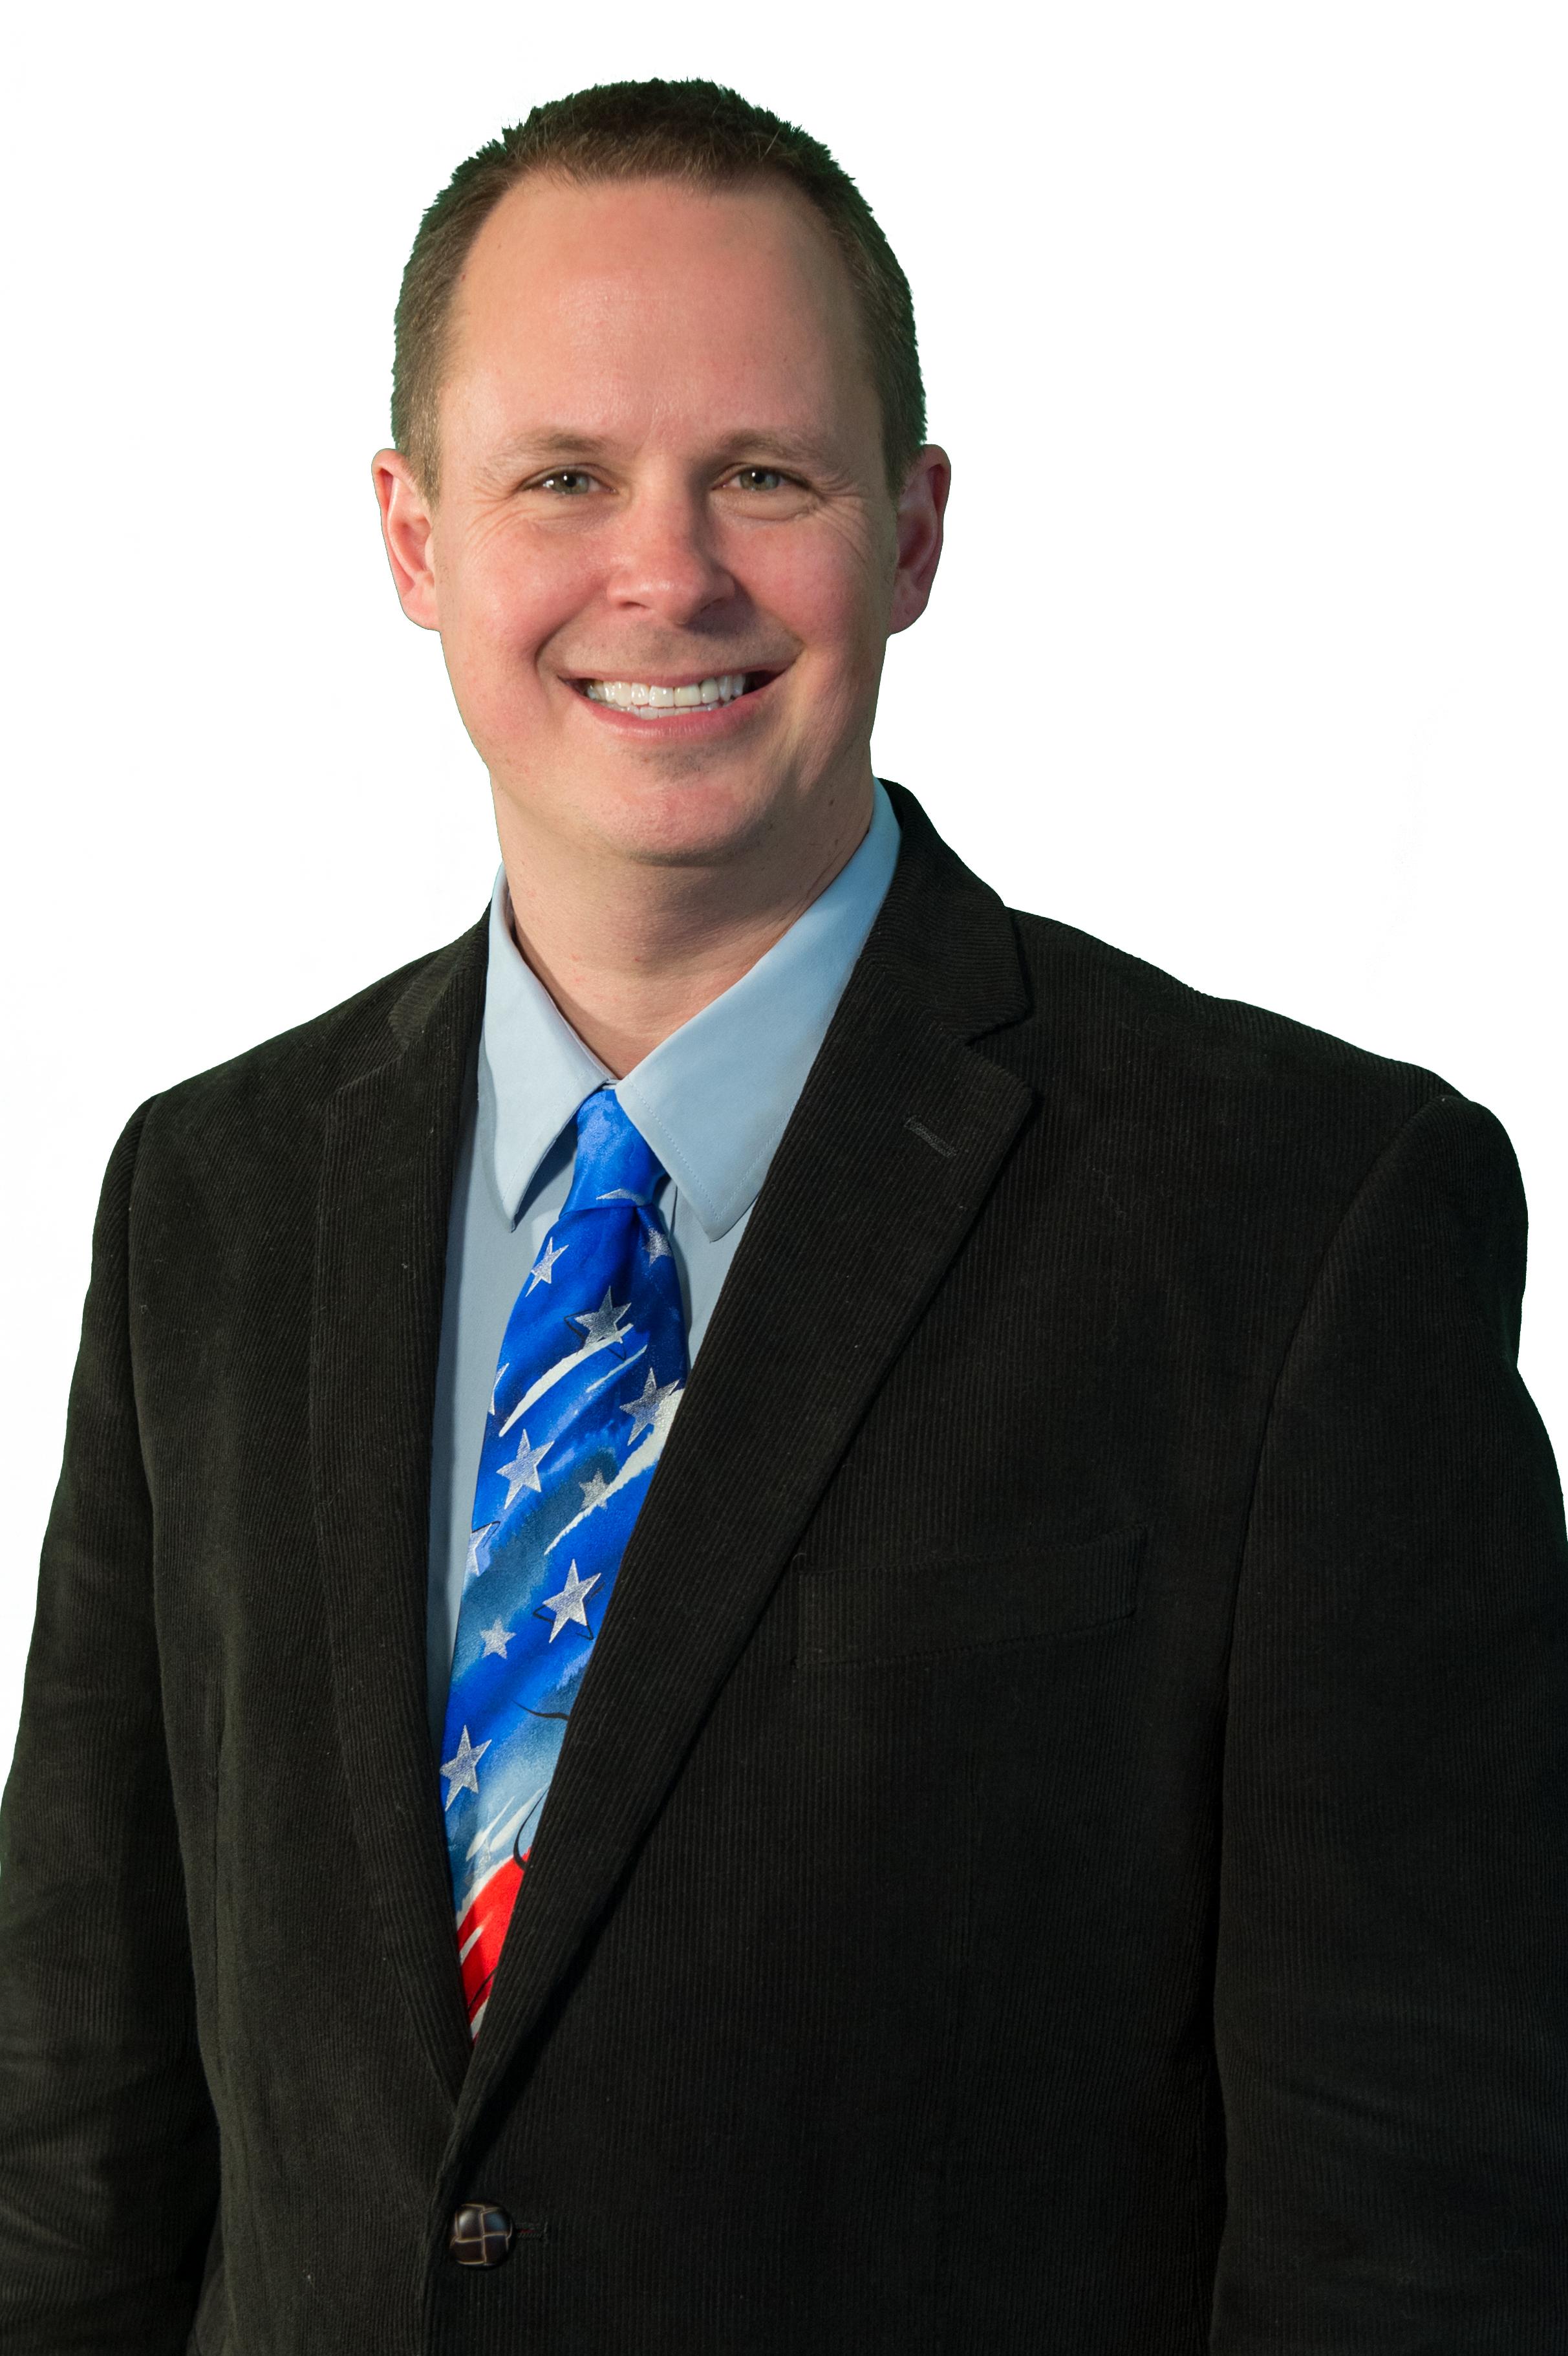 Jeffrey undefined Shauger